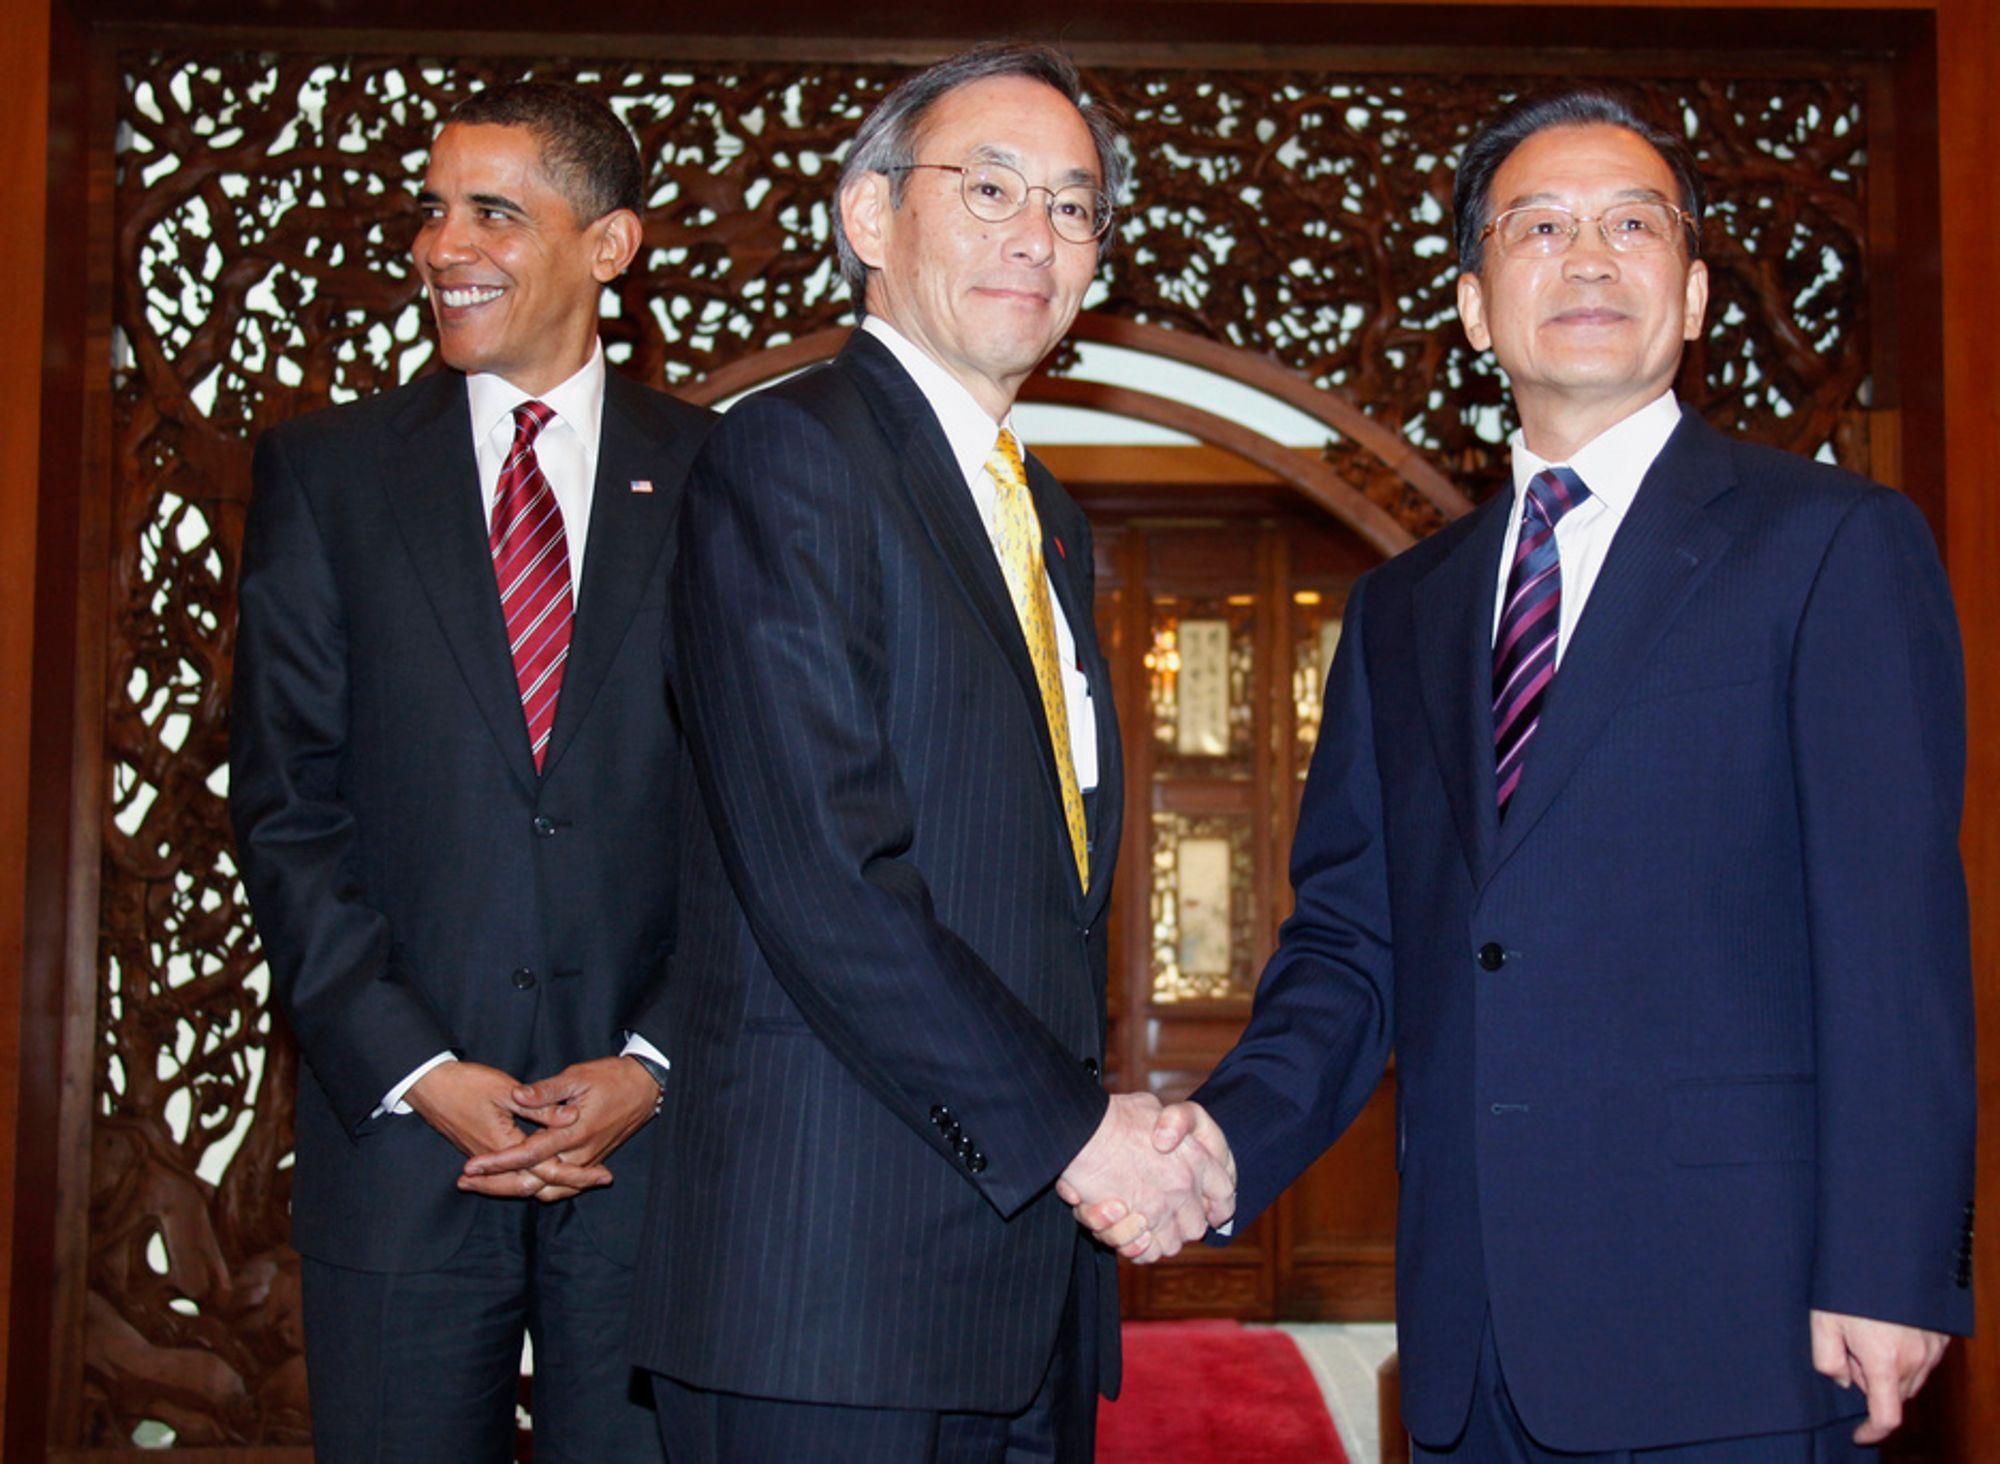 USAs energiminister Stephen Chu (i midten) vil se norske pumpekraftverk når han kommer til Norge sammen med president Obama denne uken. Her sammen med Kinas statsminister Wen Jiabao.